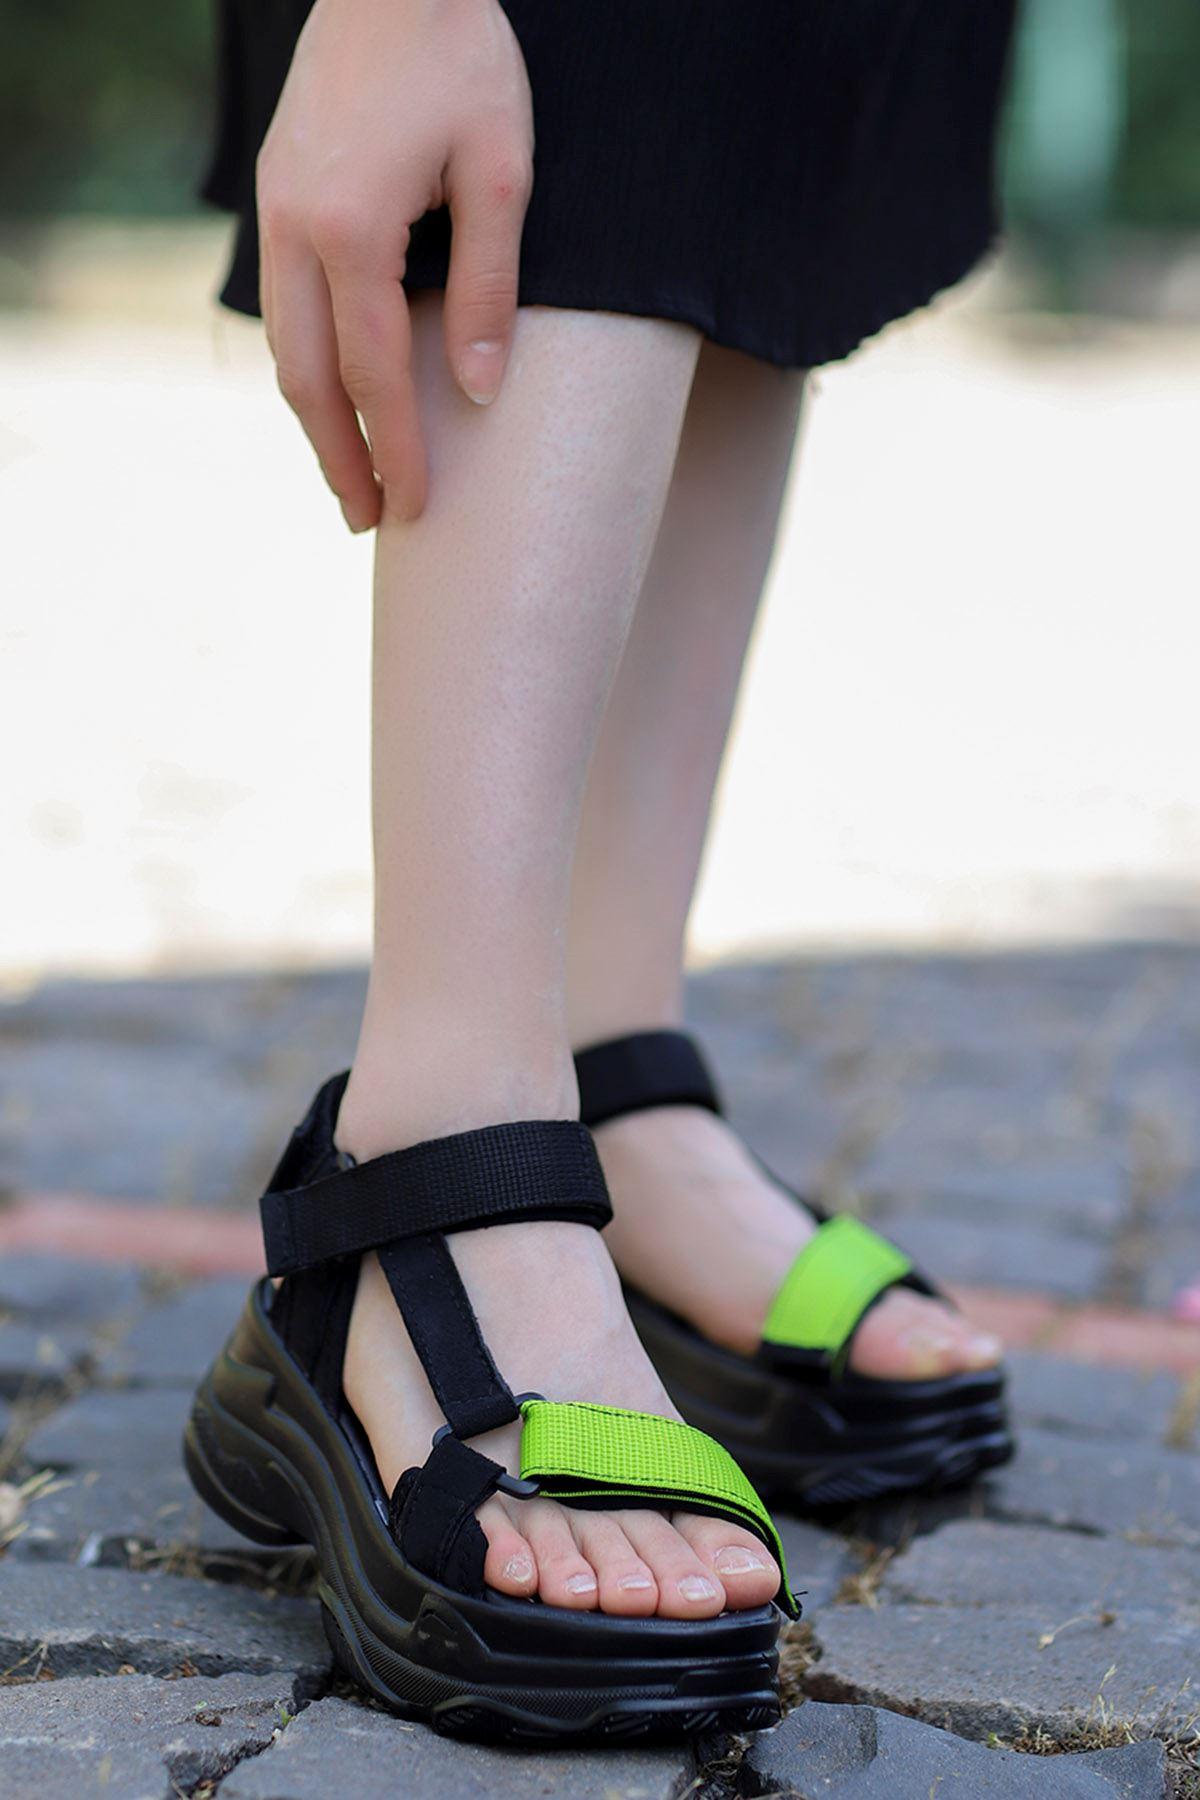 Rafael Dolgu Taban Sandalet Siyah-Ön Bant Çim Yeşil